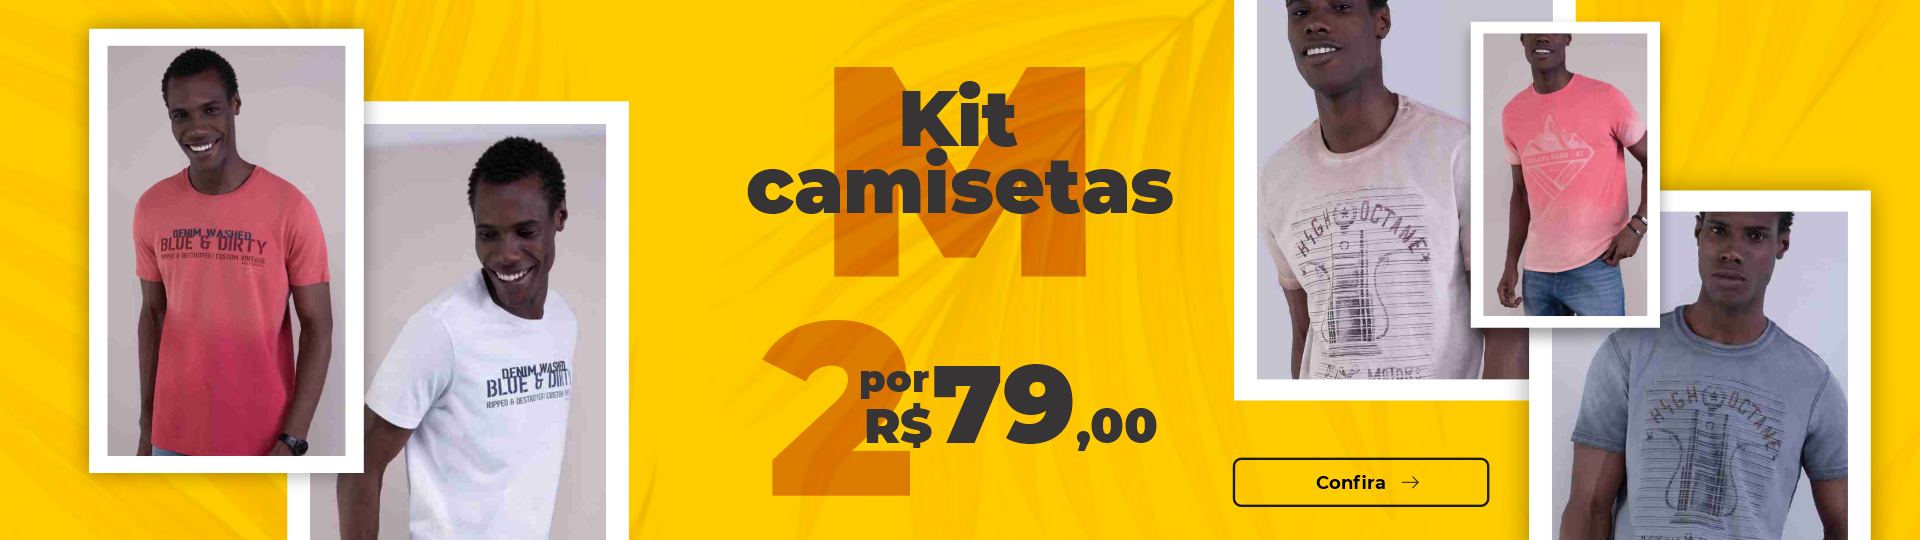 2 CAMISETAS POR 79,90